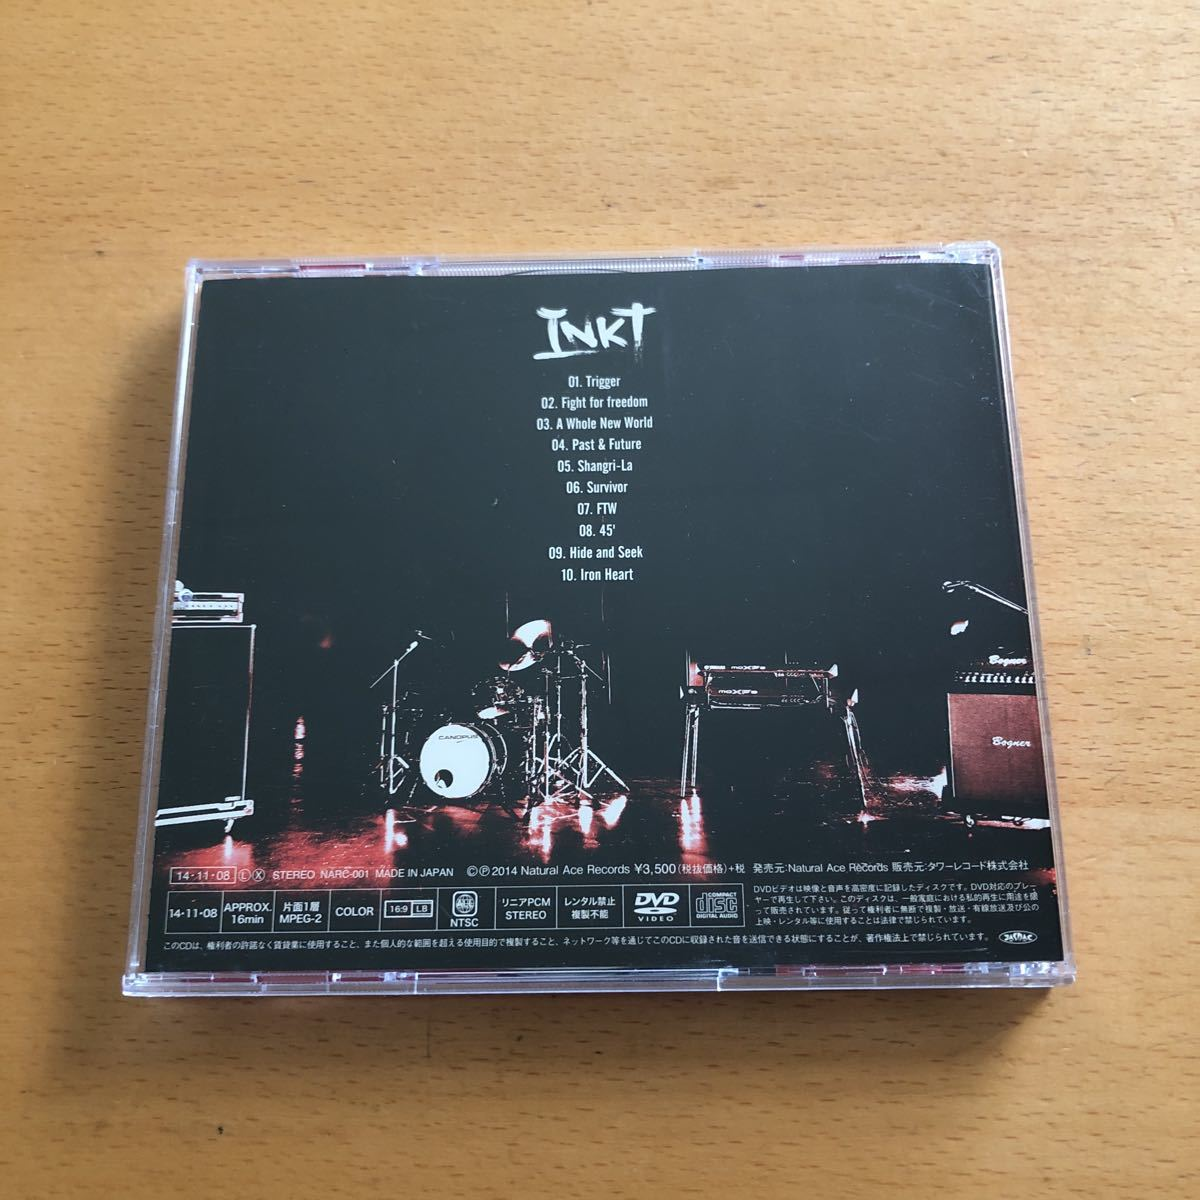 INKT『INKT』初回限定盤CD+DVD☆帯付☆美品☆アルバム☆ステッカー付☆96_画像4